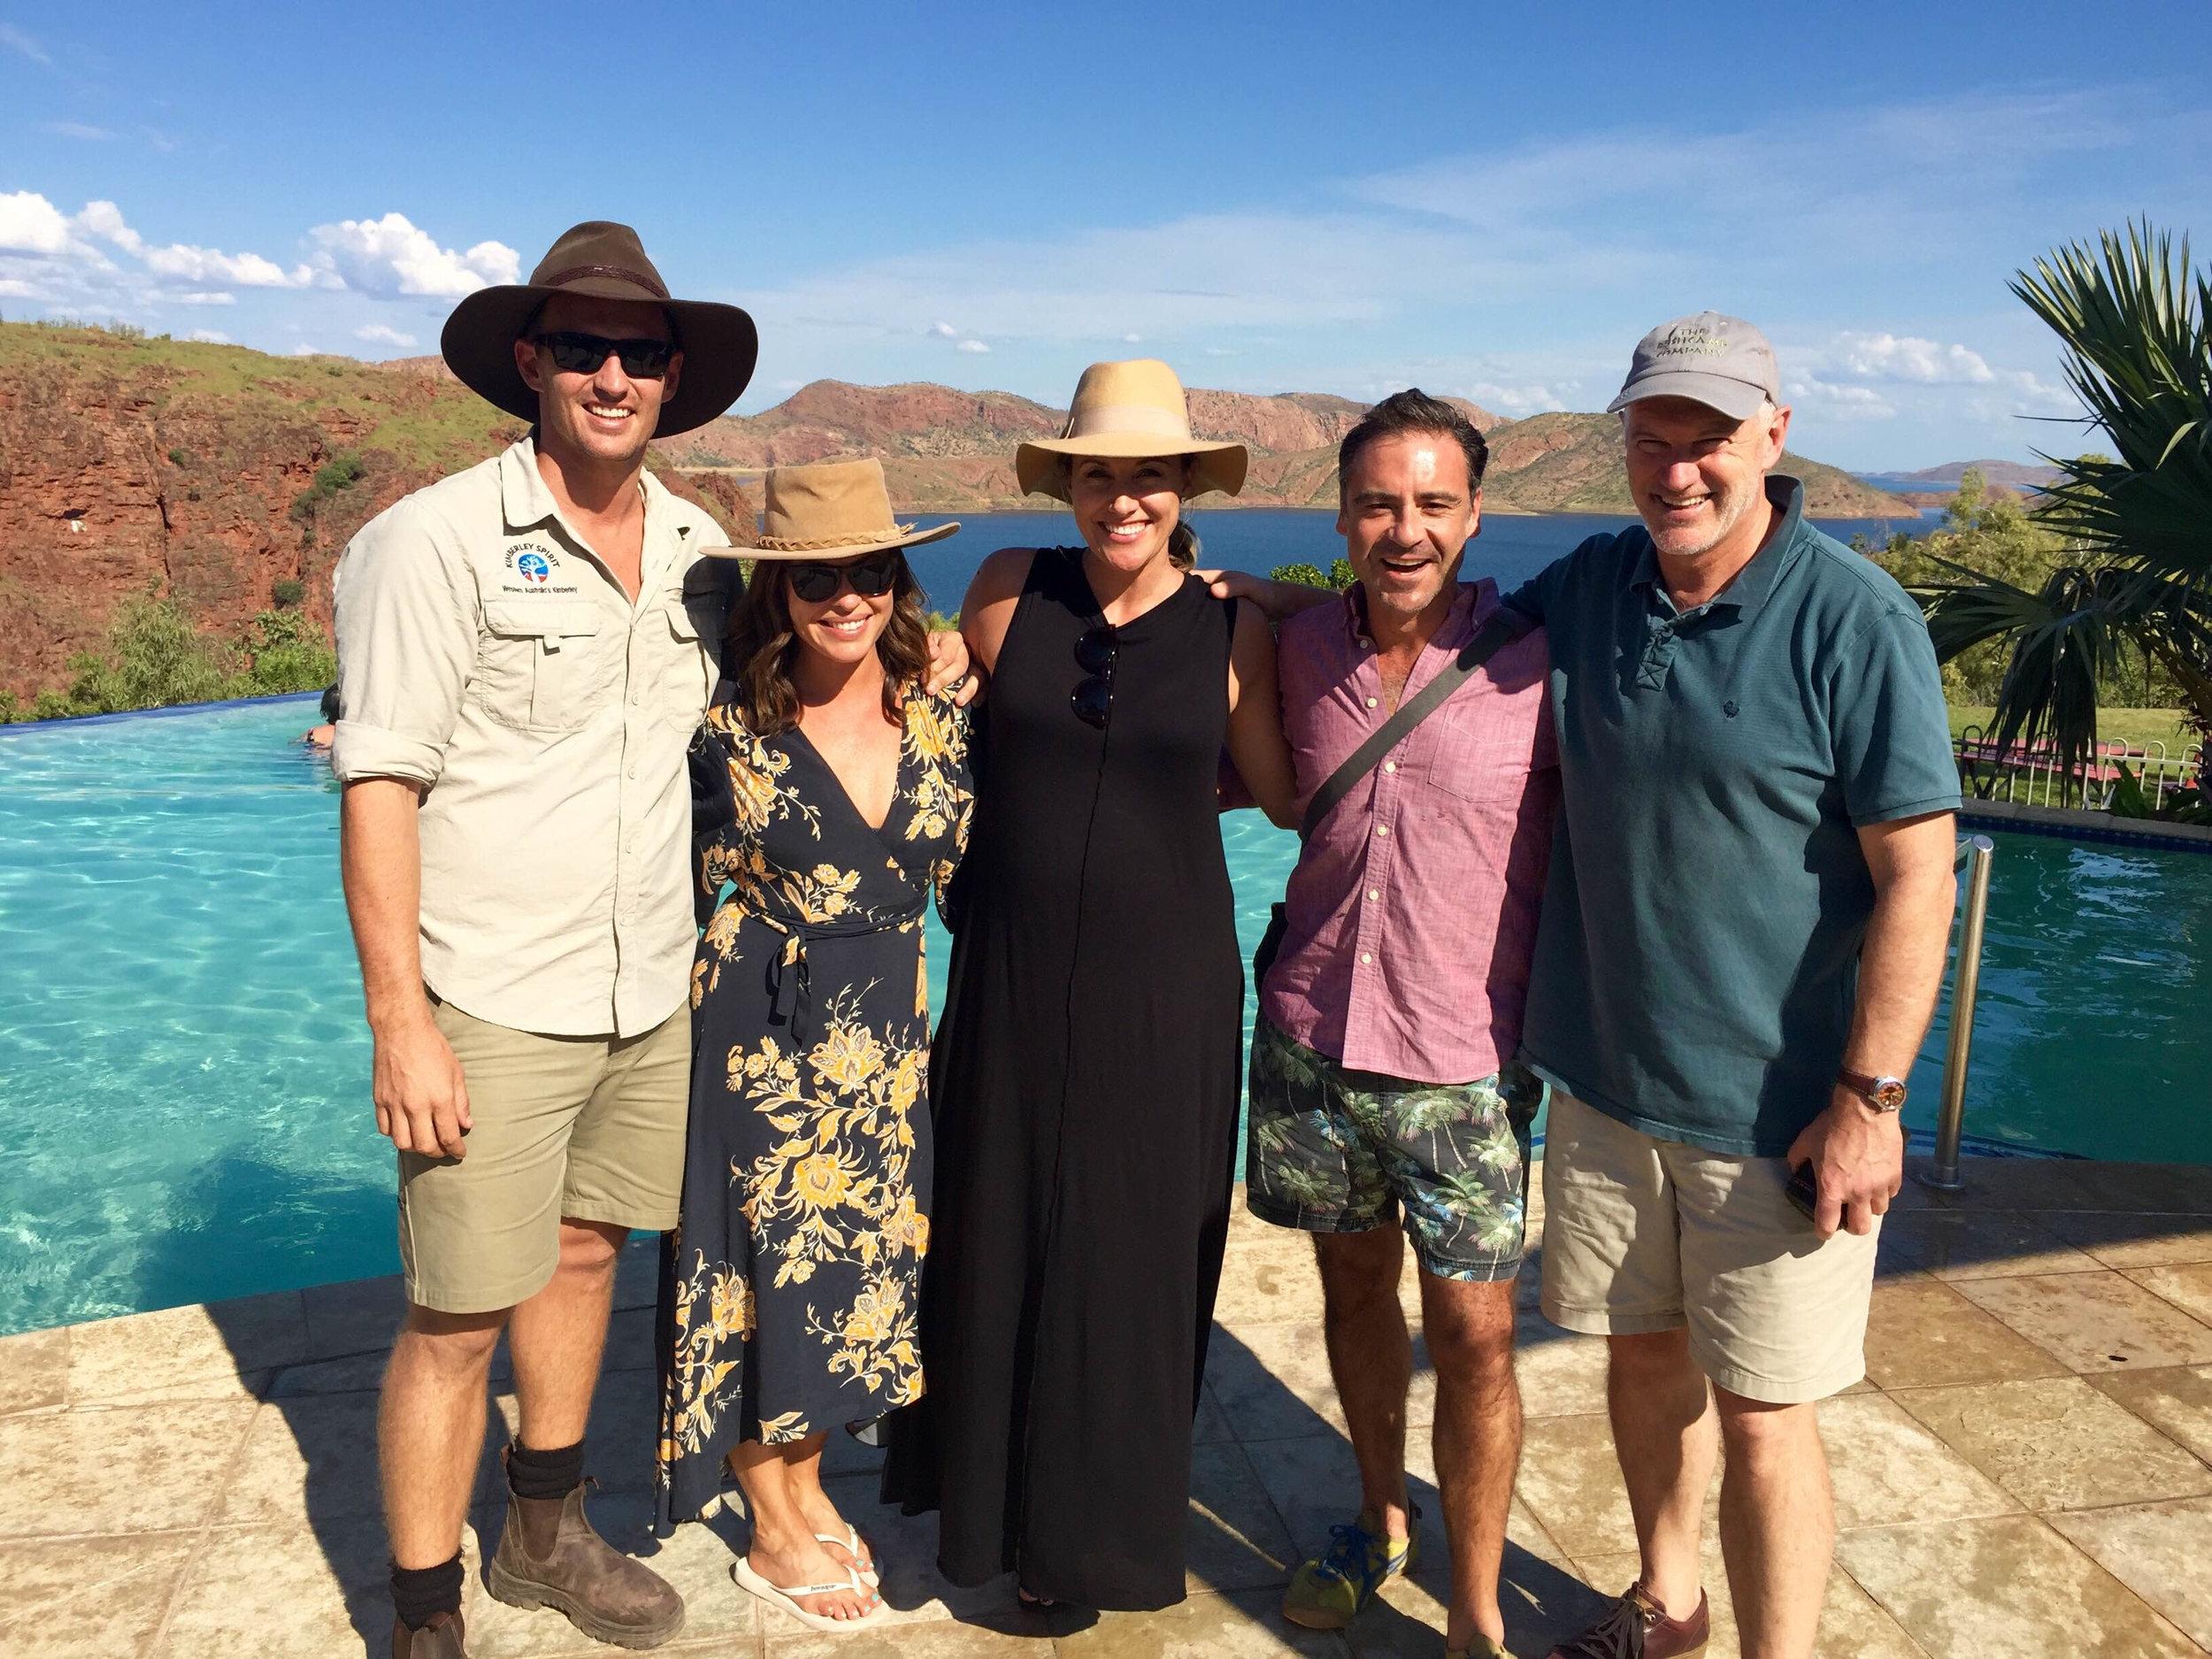 On location with the Sunrise crew at Lake Argyle